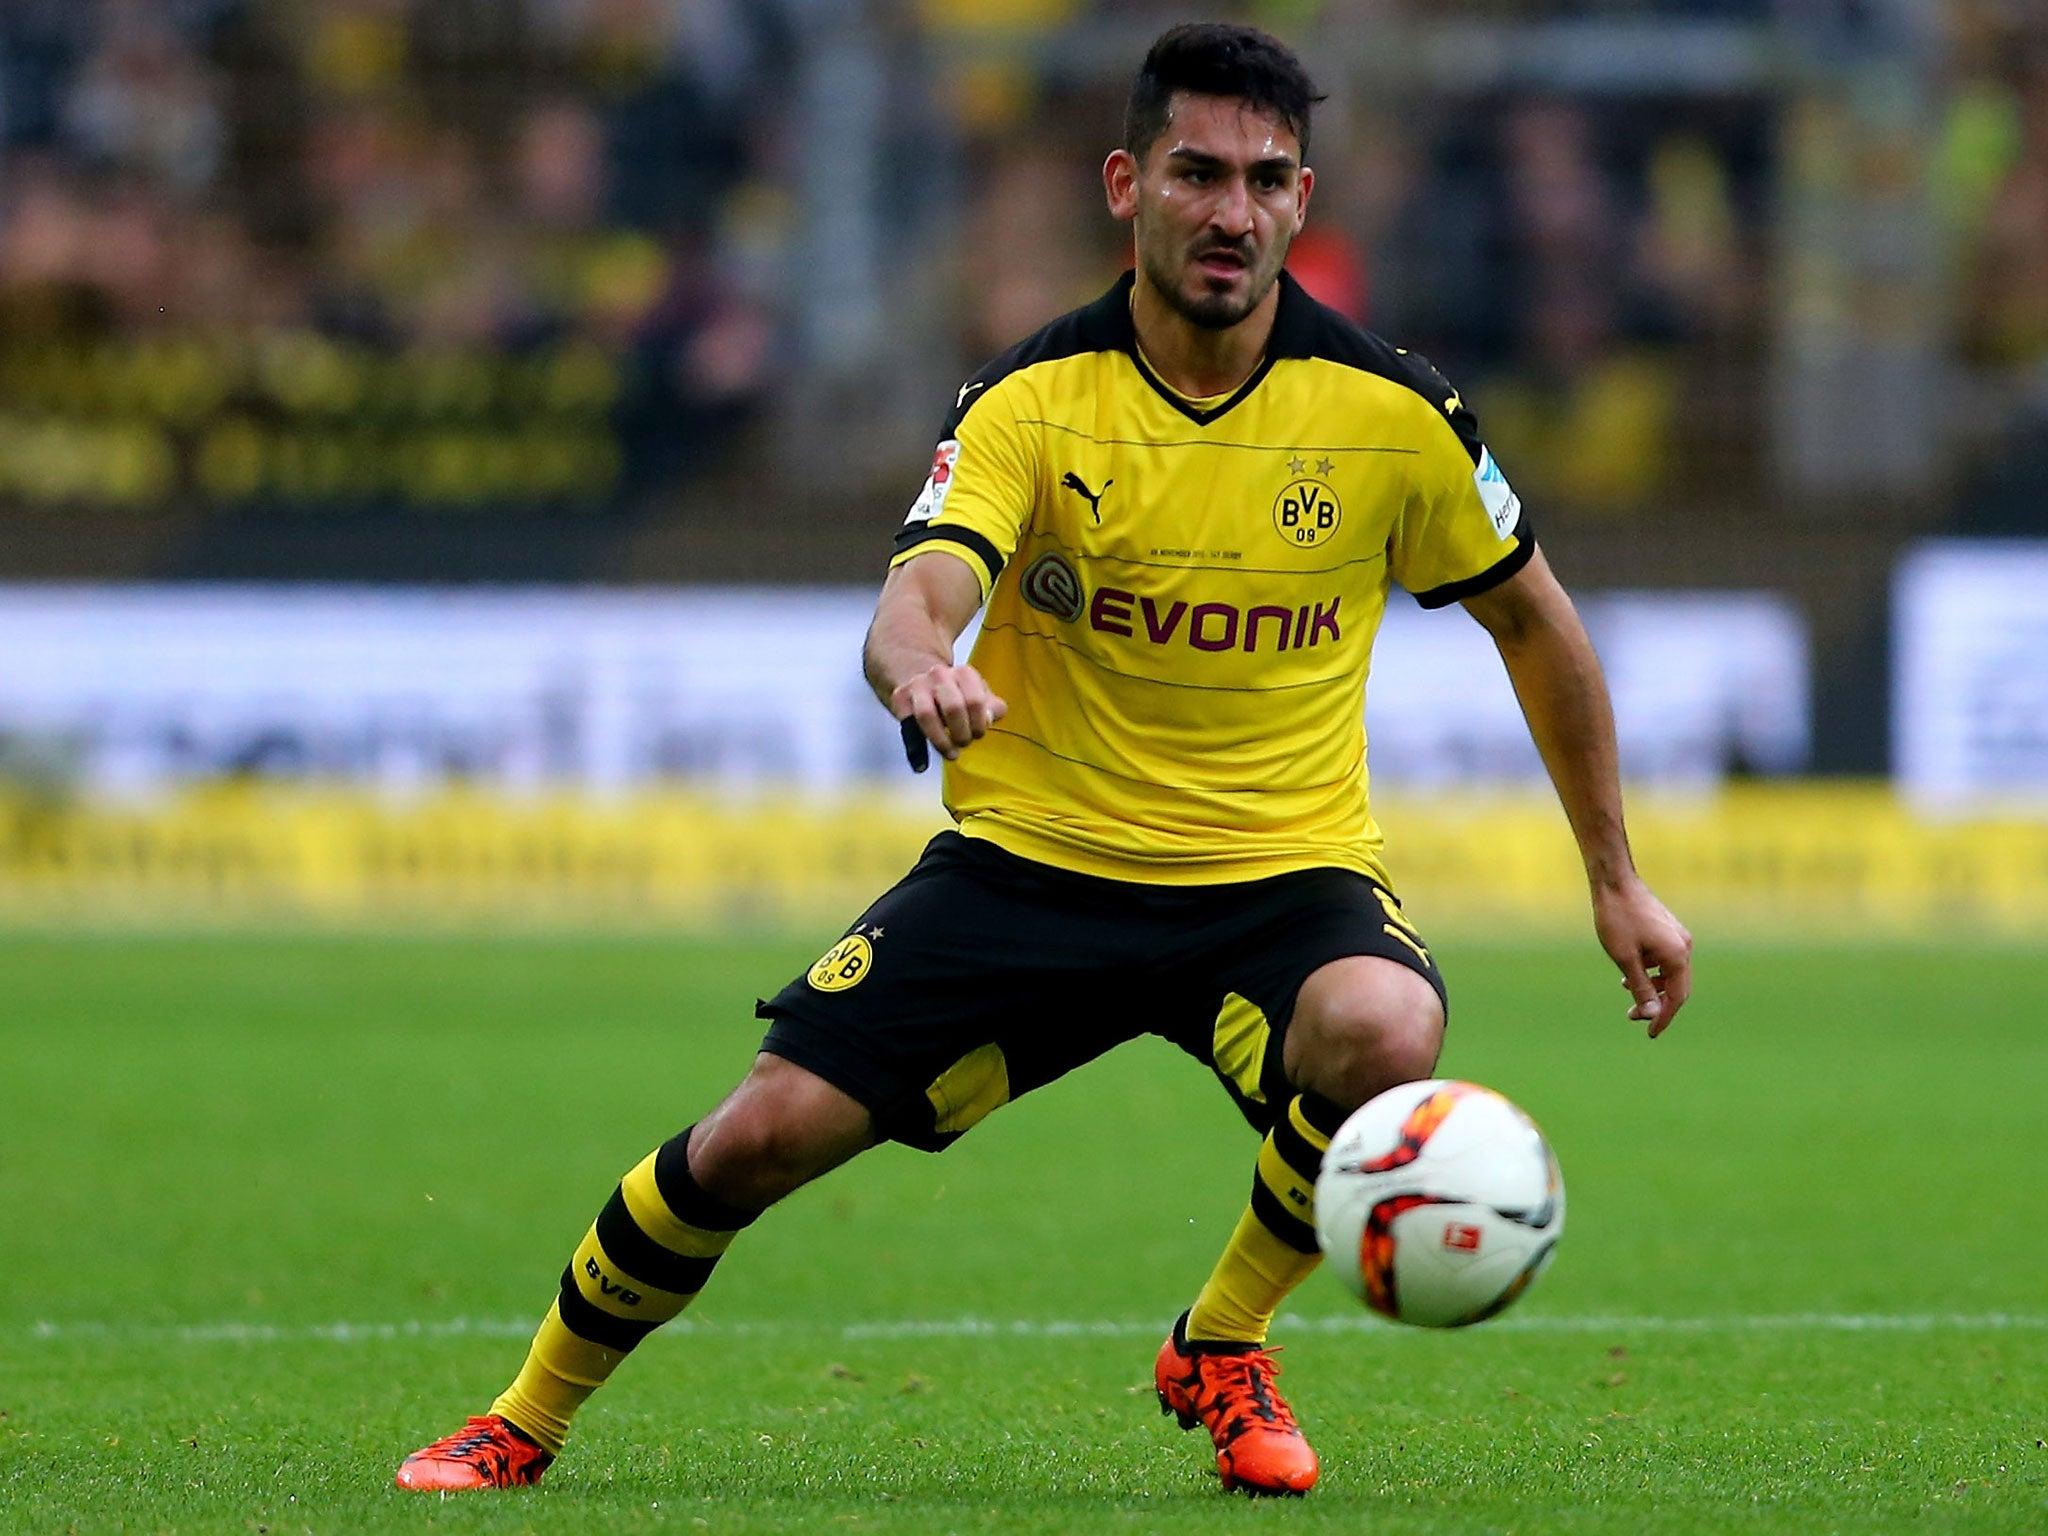 Ilkay Gundogan to Manchester City Borussia Dortmund midfielder on